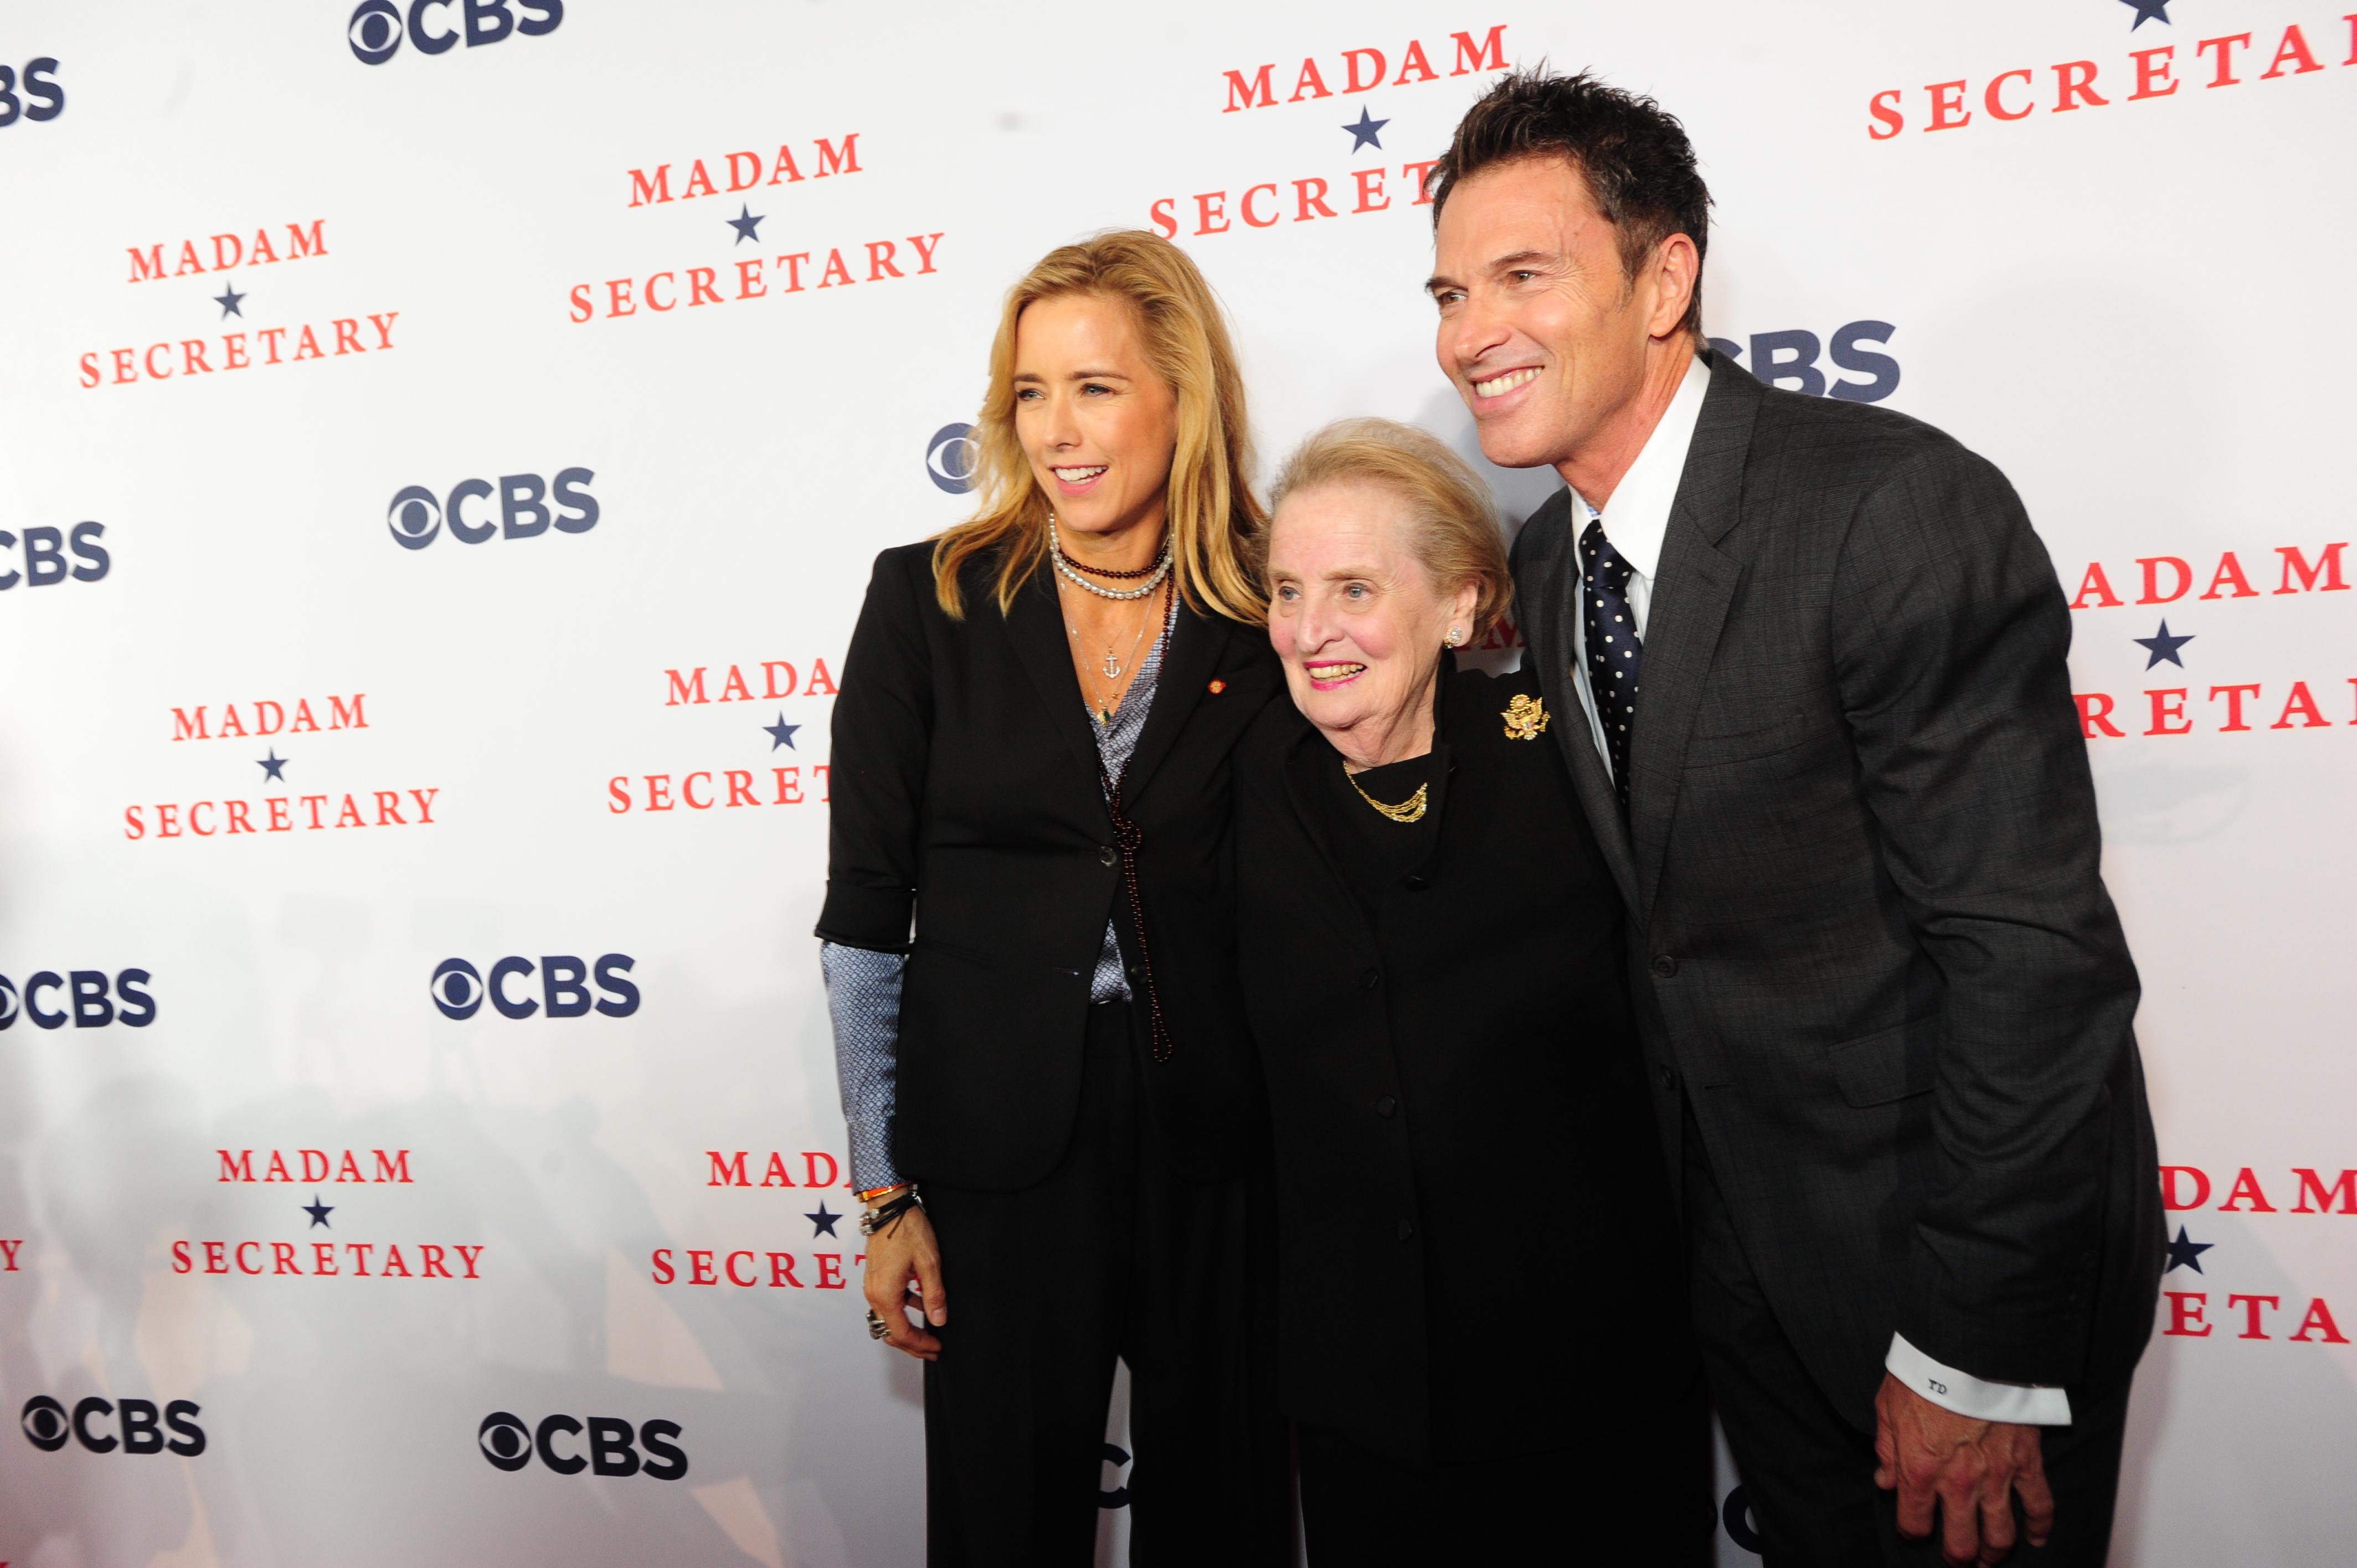 Téa Leoni, Madeleine Albright, Tim Daly on the Red Carpet